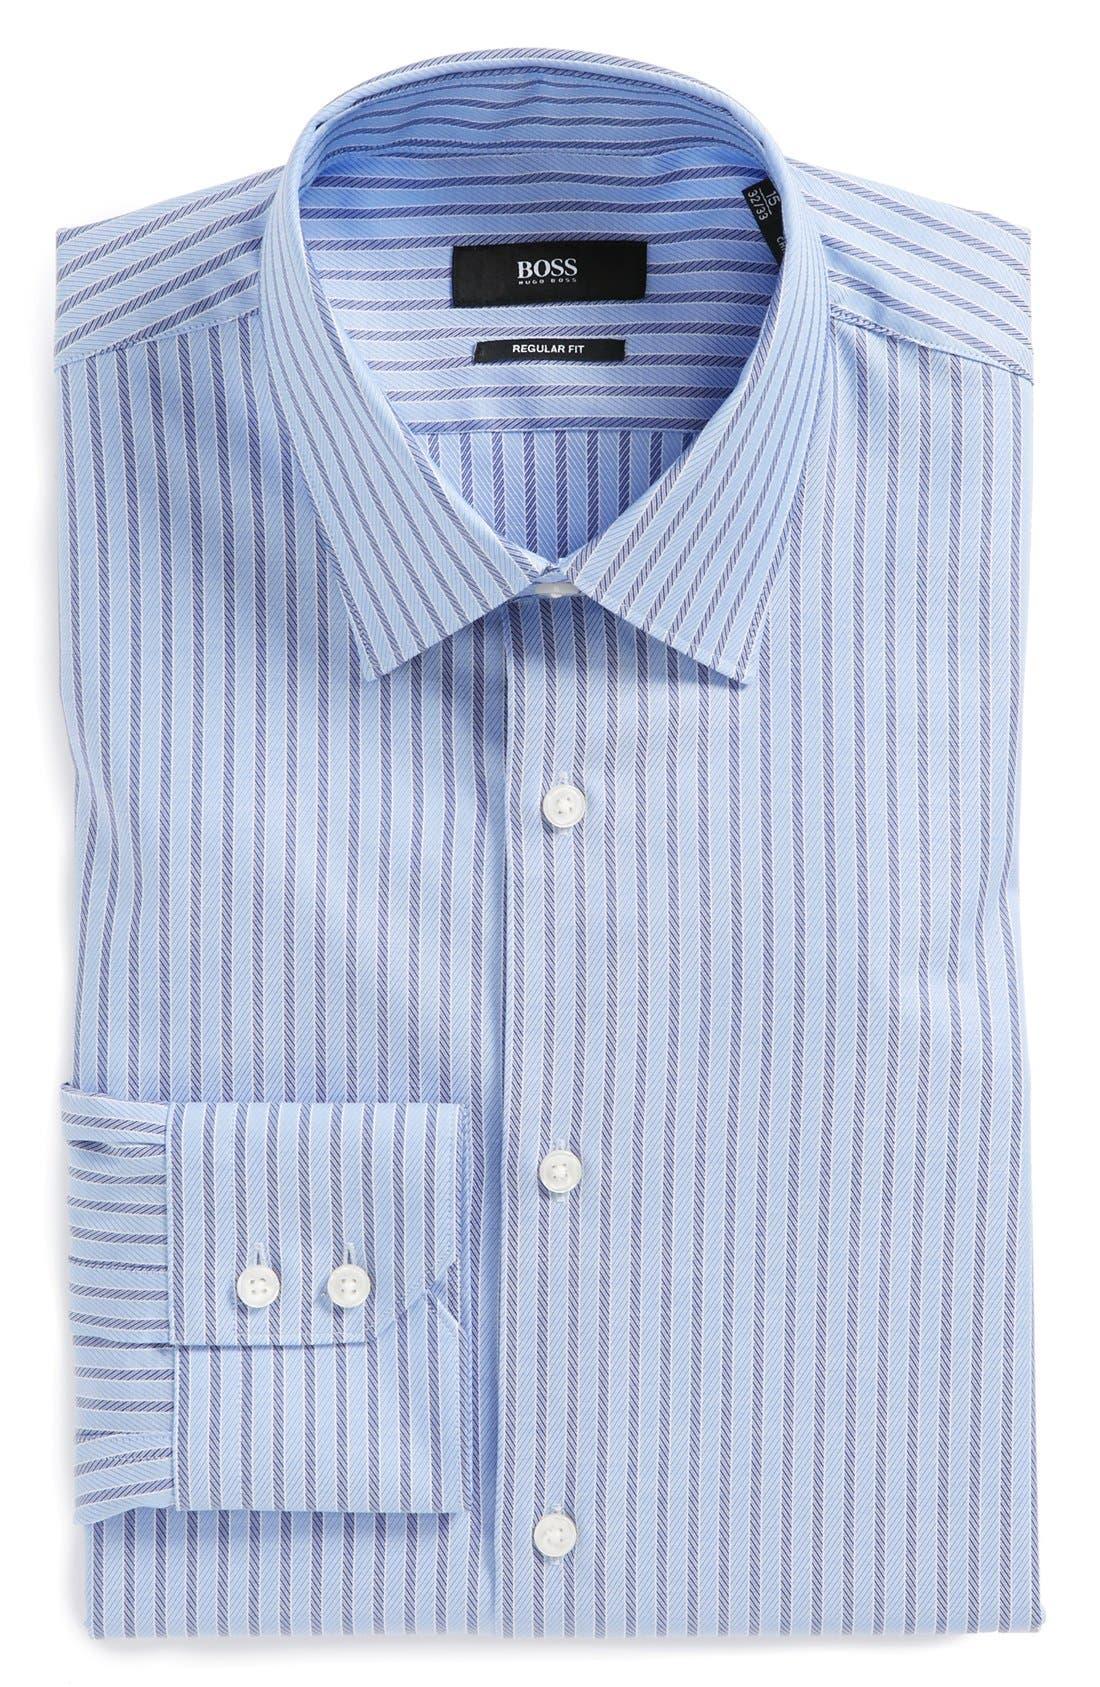 Alternate Image 1 Selected - BOSS HUGO BOSS 'Gulio' US Regular Fit Dress Shirt